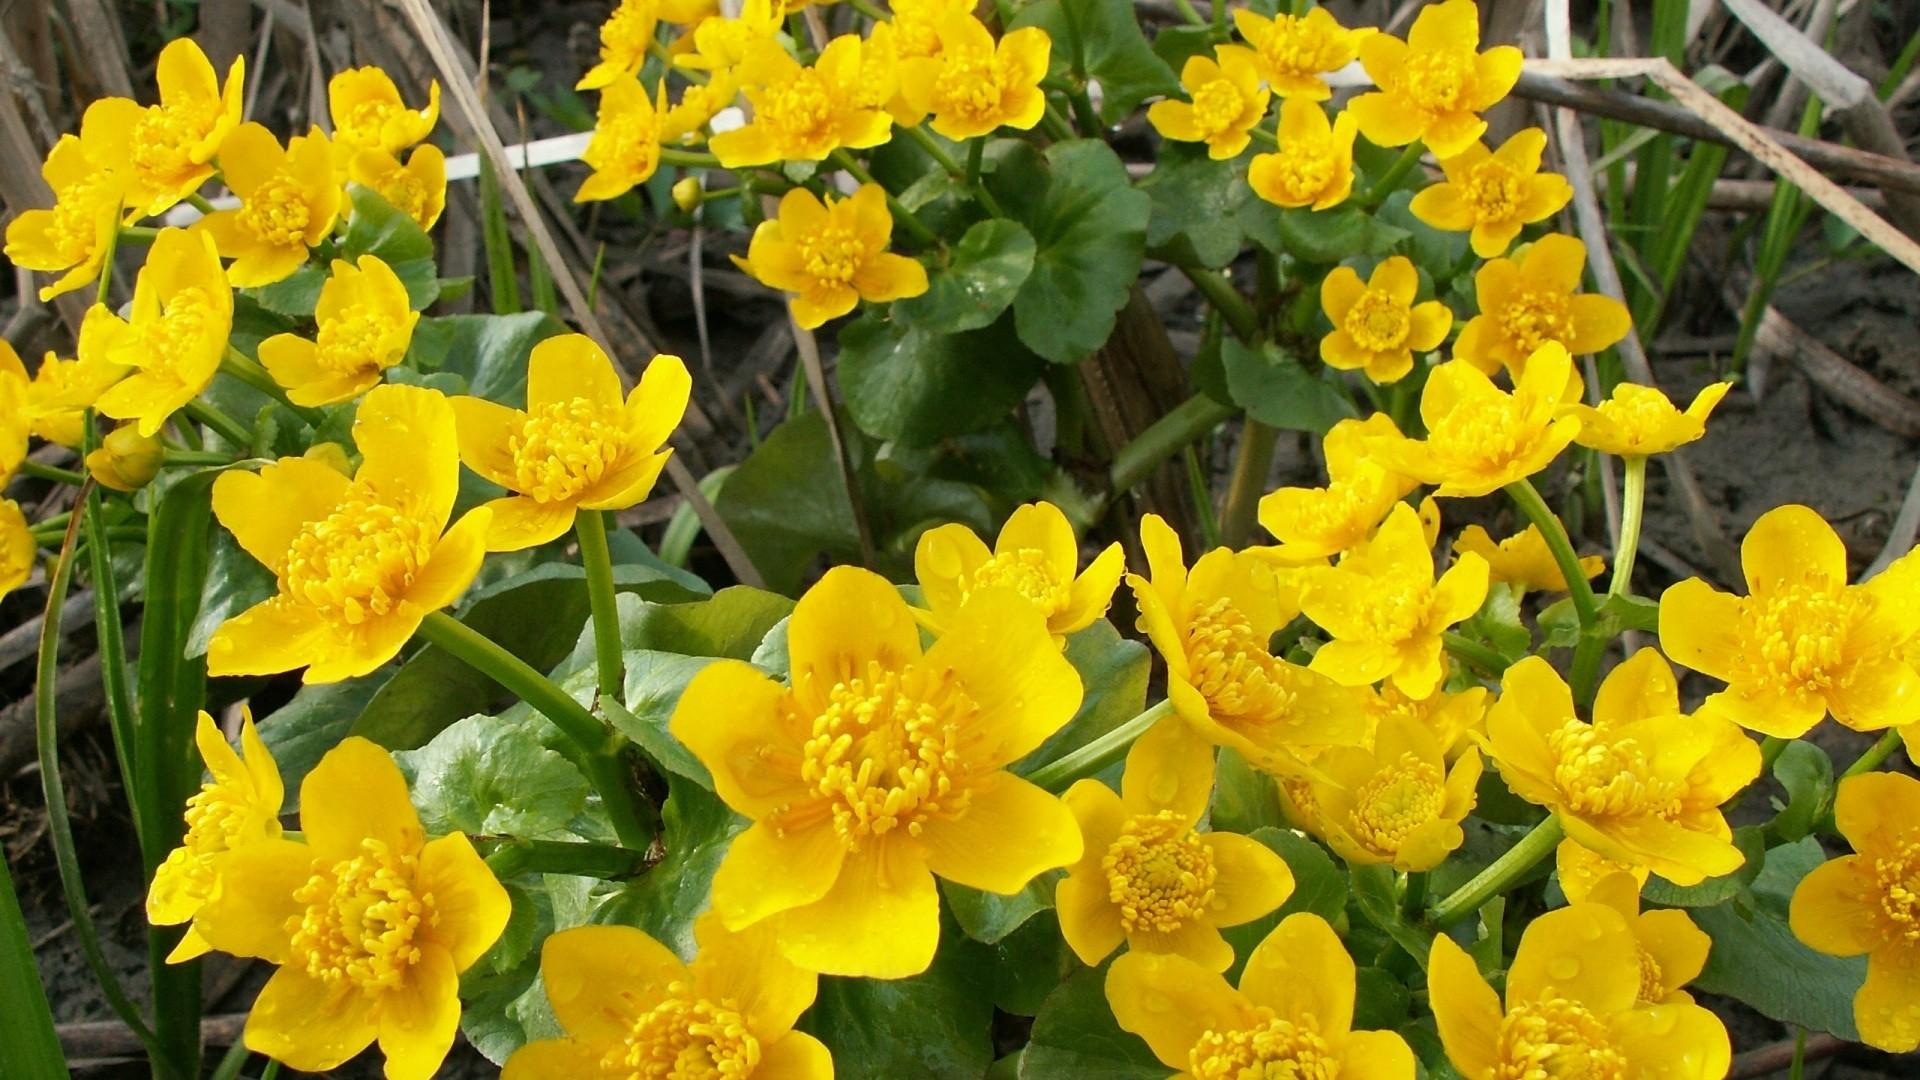 Top 15 Beautiful Yellow Flowers In The World Yabibo